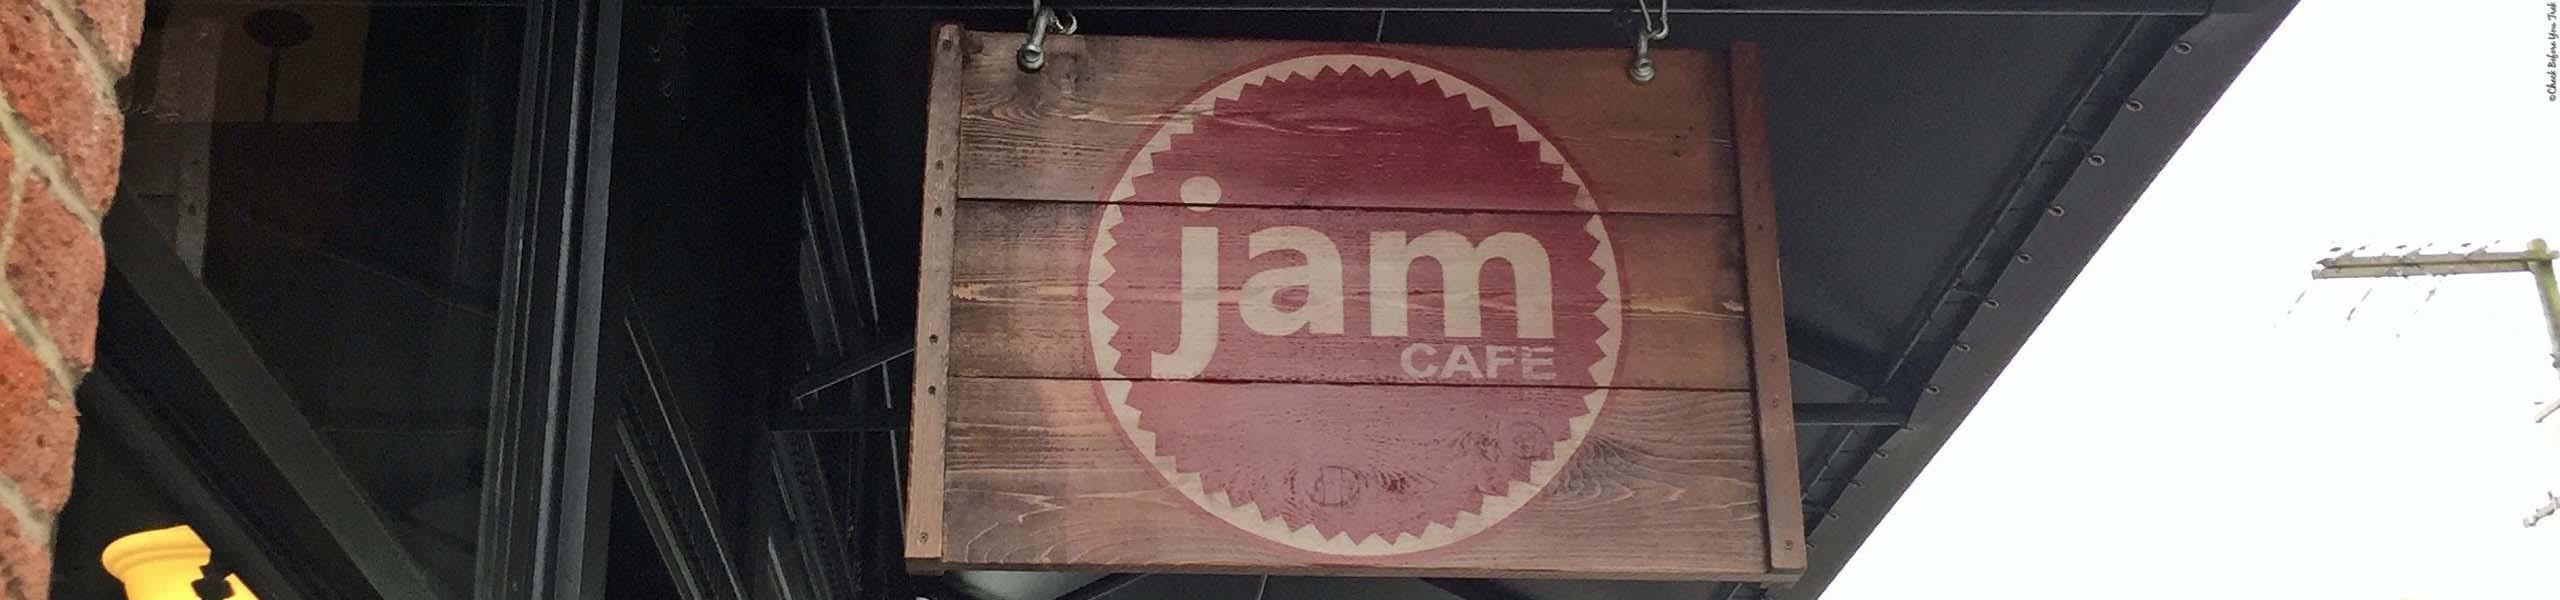 Jam Cafe - Vancouver, British Columbia, Canada